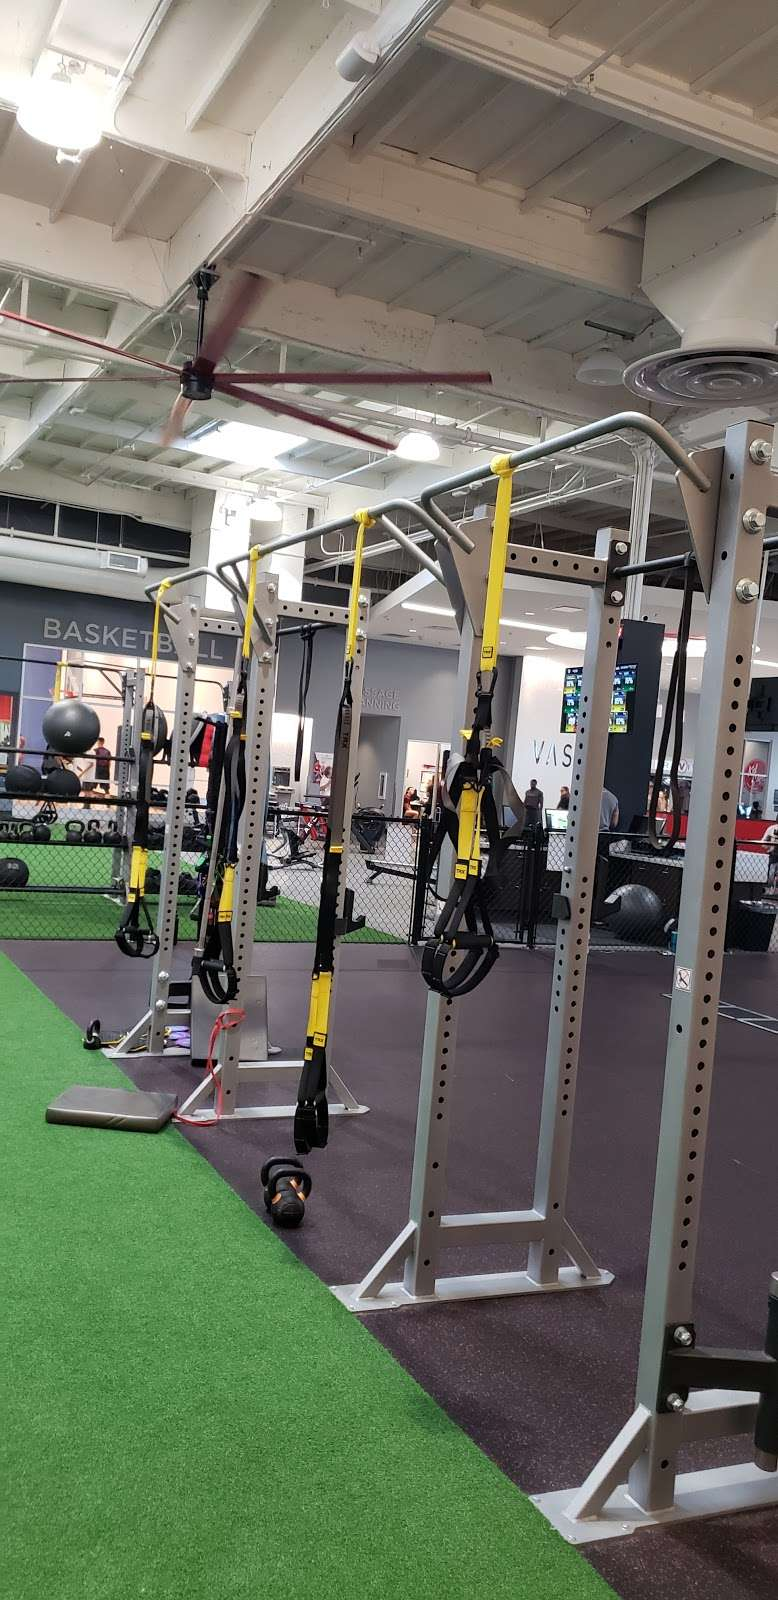 VASA Fitness - gym    Photo 2 of 9   Address: 4255 W Thunderbird Rd, Phoenix, AZ 85053, USA   Phone: (602) 603-0811